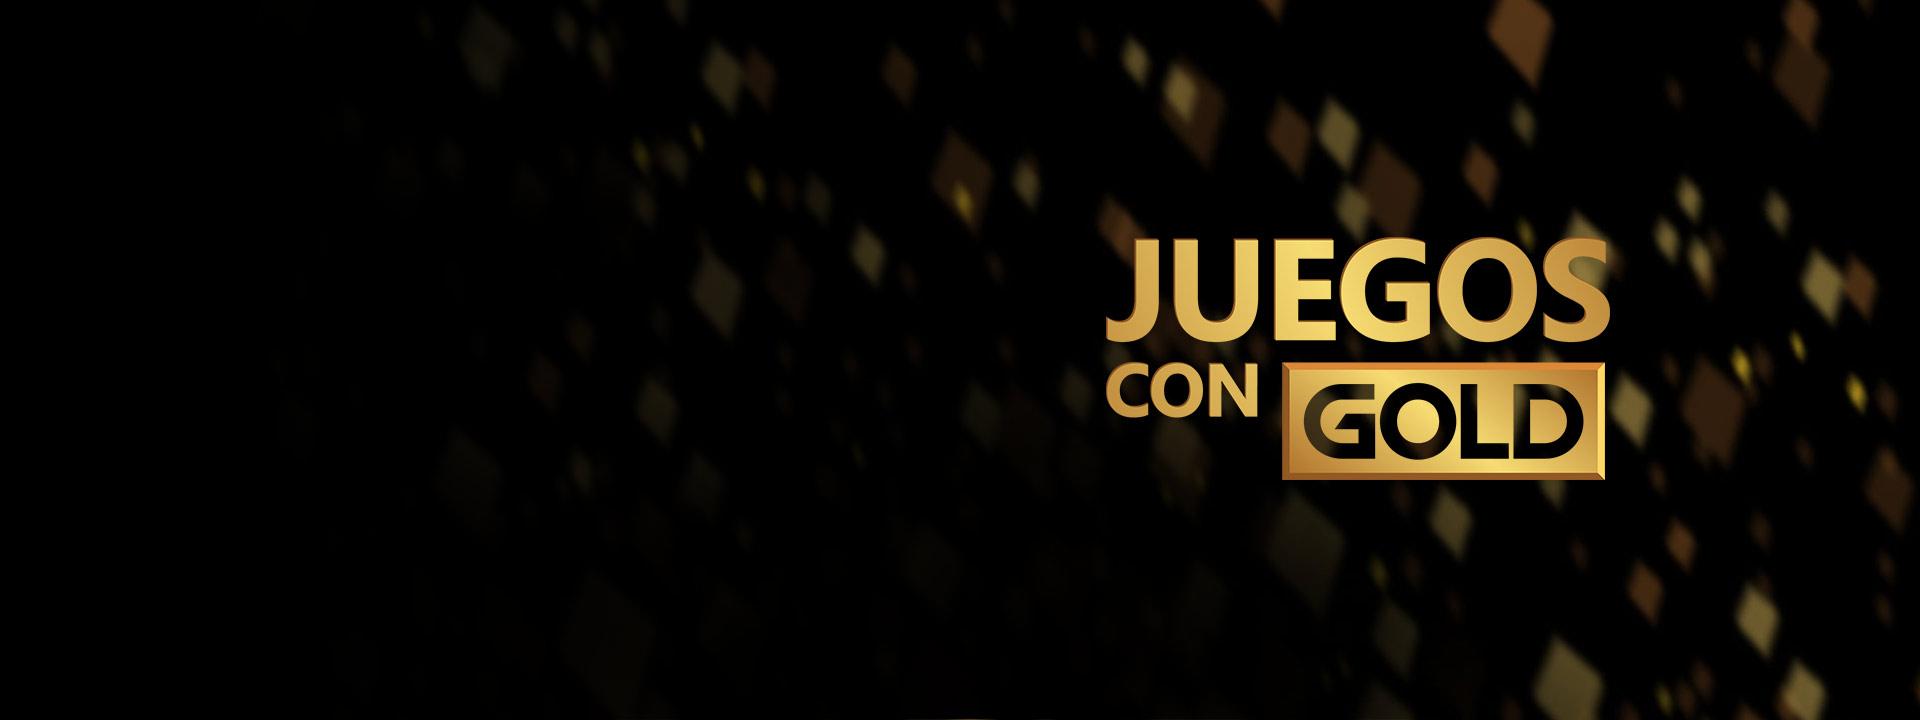 Juegos Con Gold Xbox Live